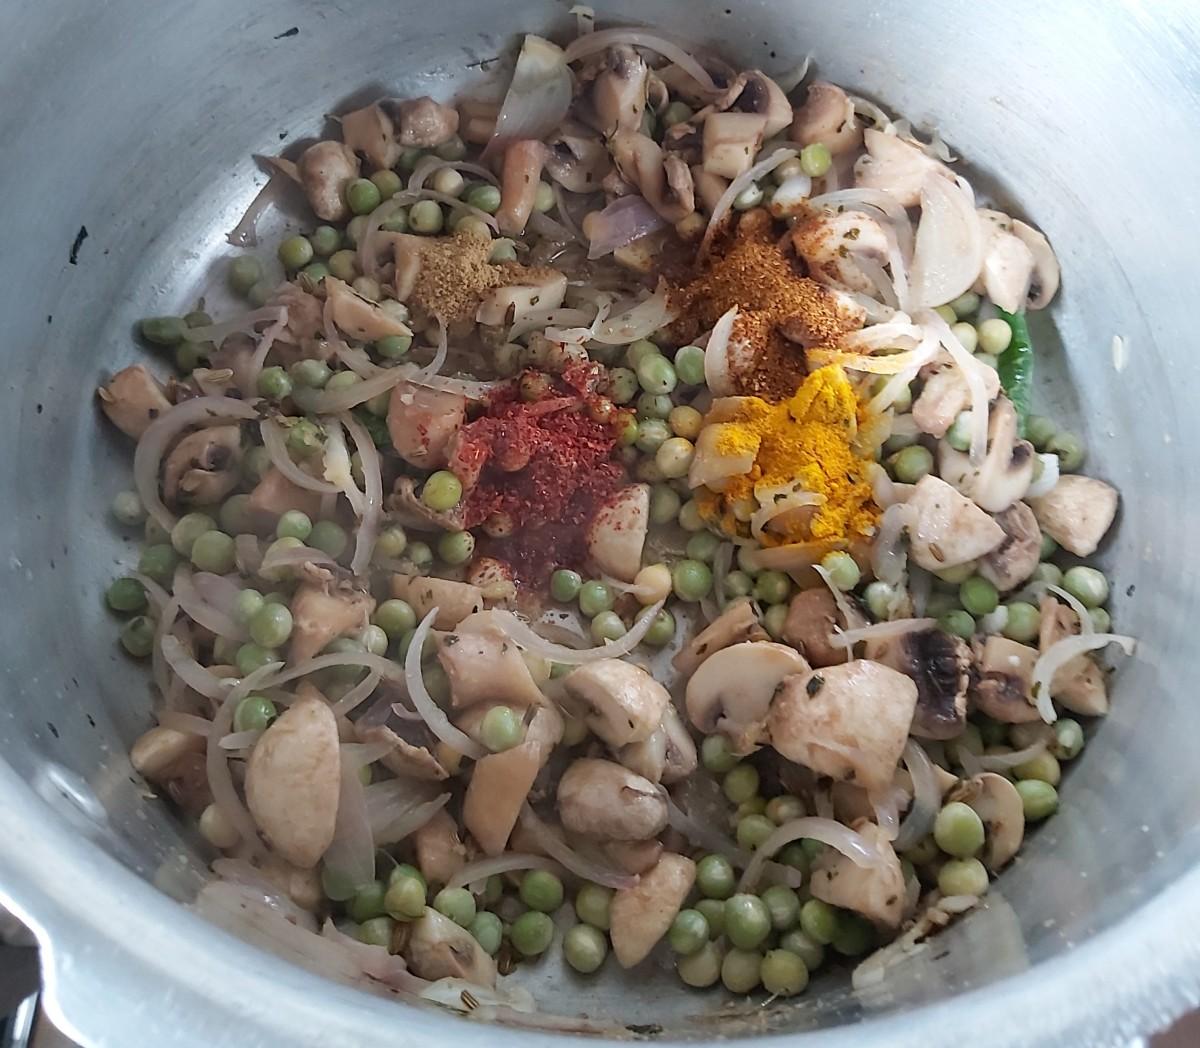 Add 1/2 teaspoon of turmeric powder, 1-2 teaspoons of red chili powder, 1-2 teaspoons of coriander powder and 1/2 teaspoon of garam masala powder.